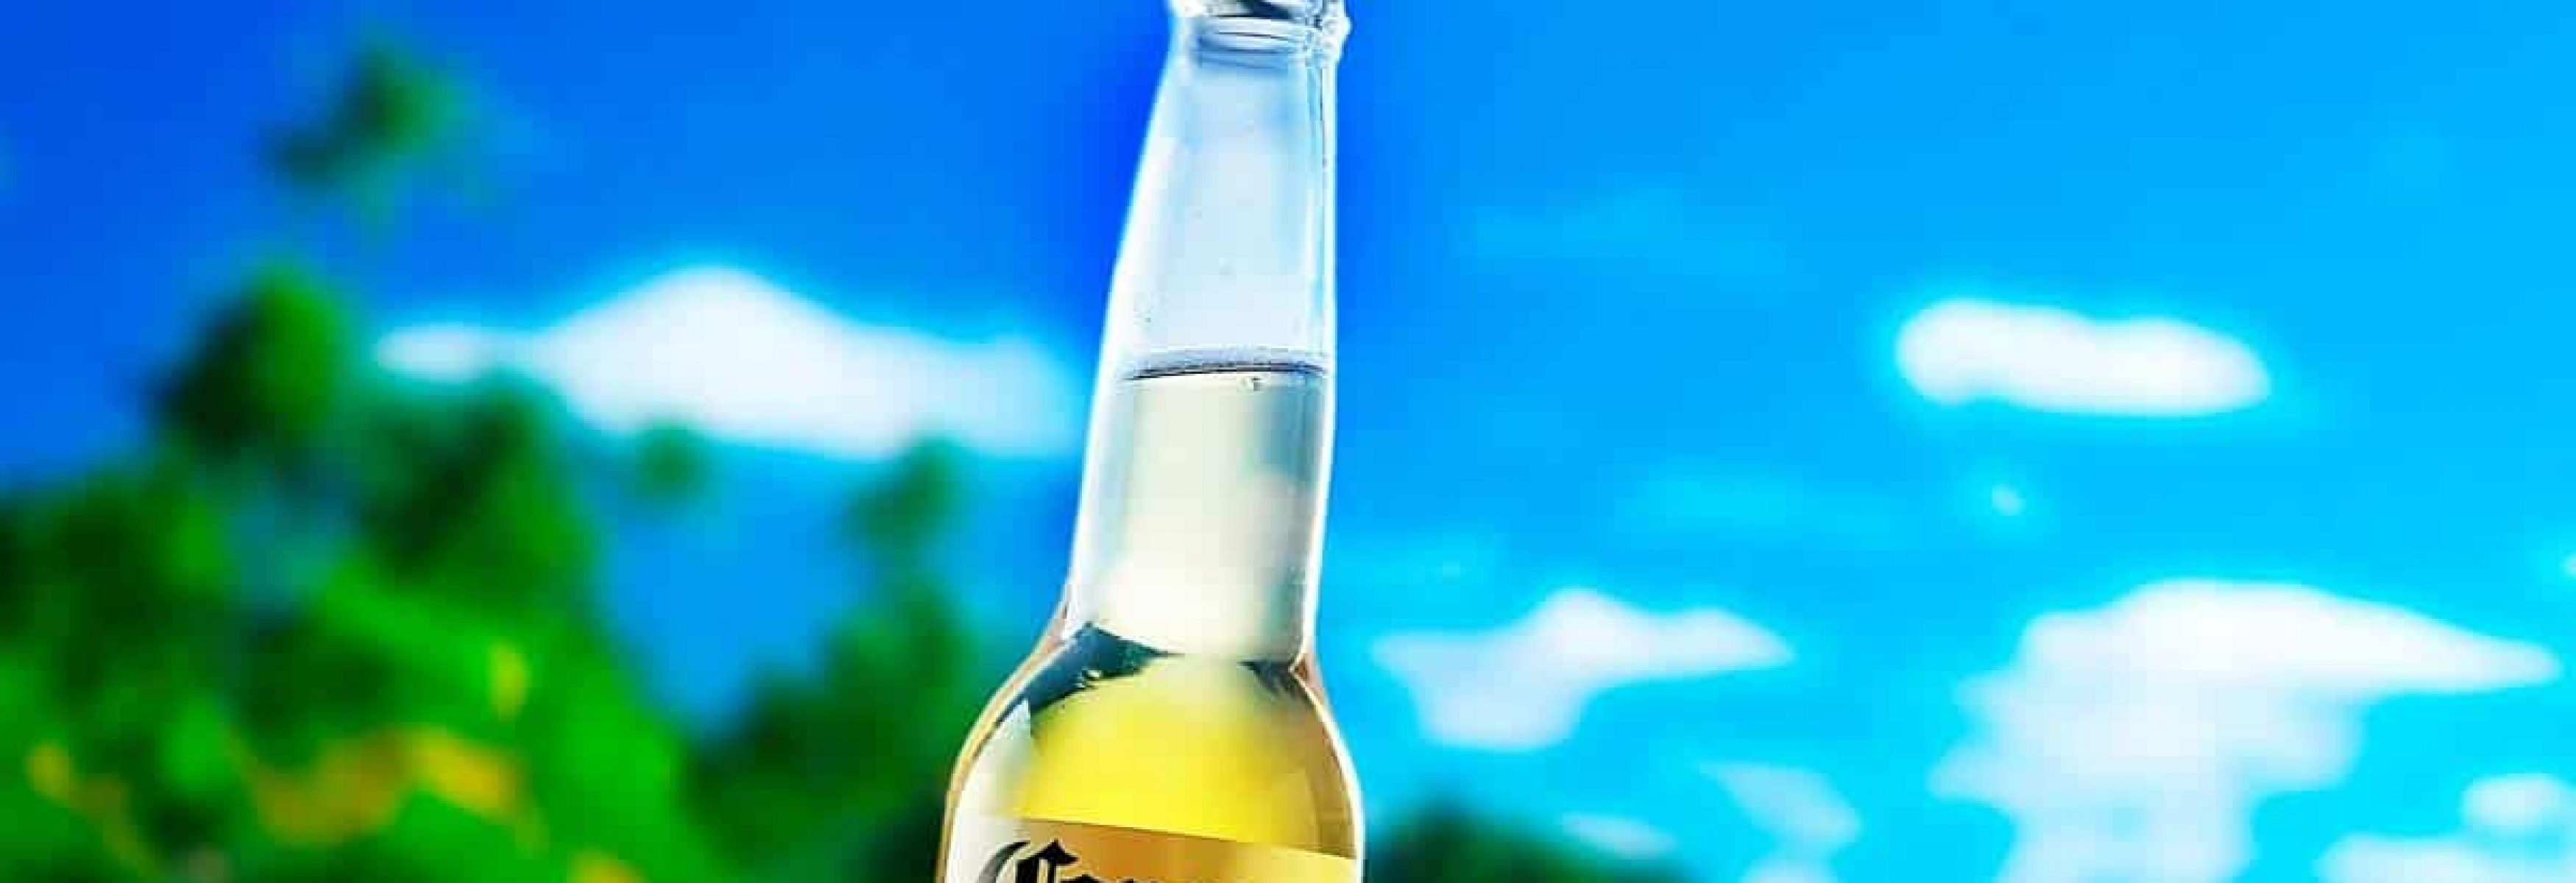 Depositphotos_141624018_l-2015-corona-beer_web_main